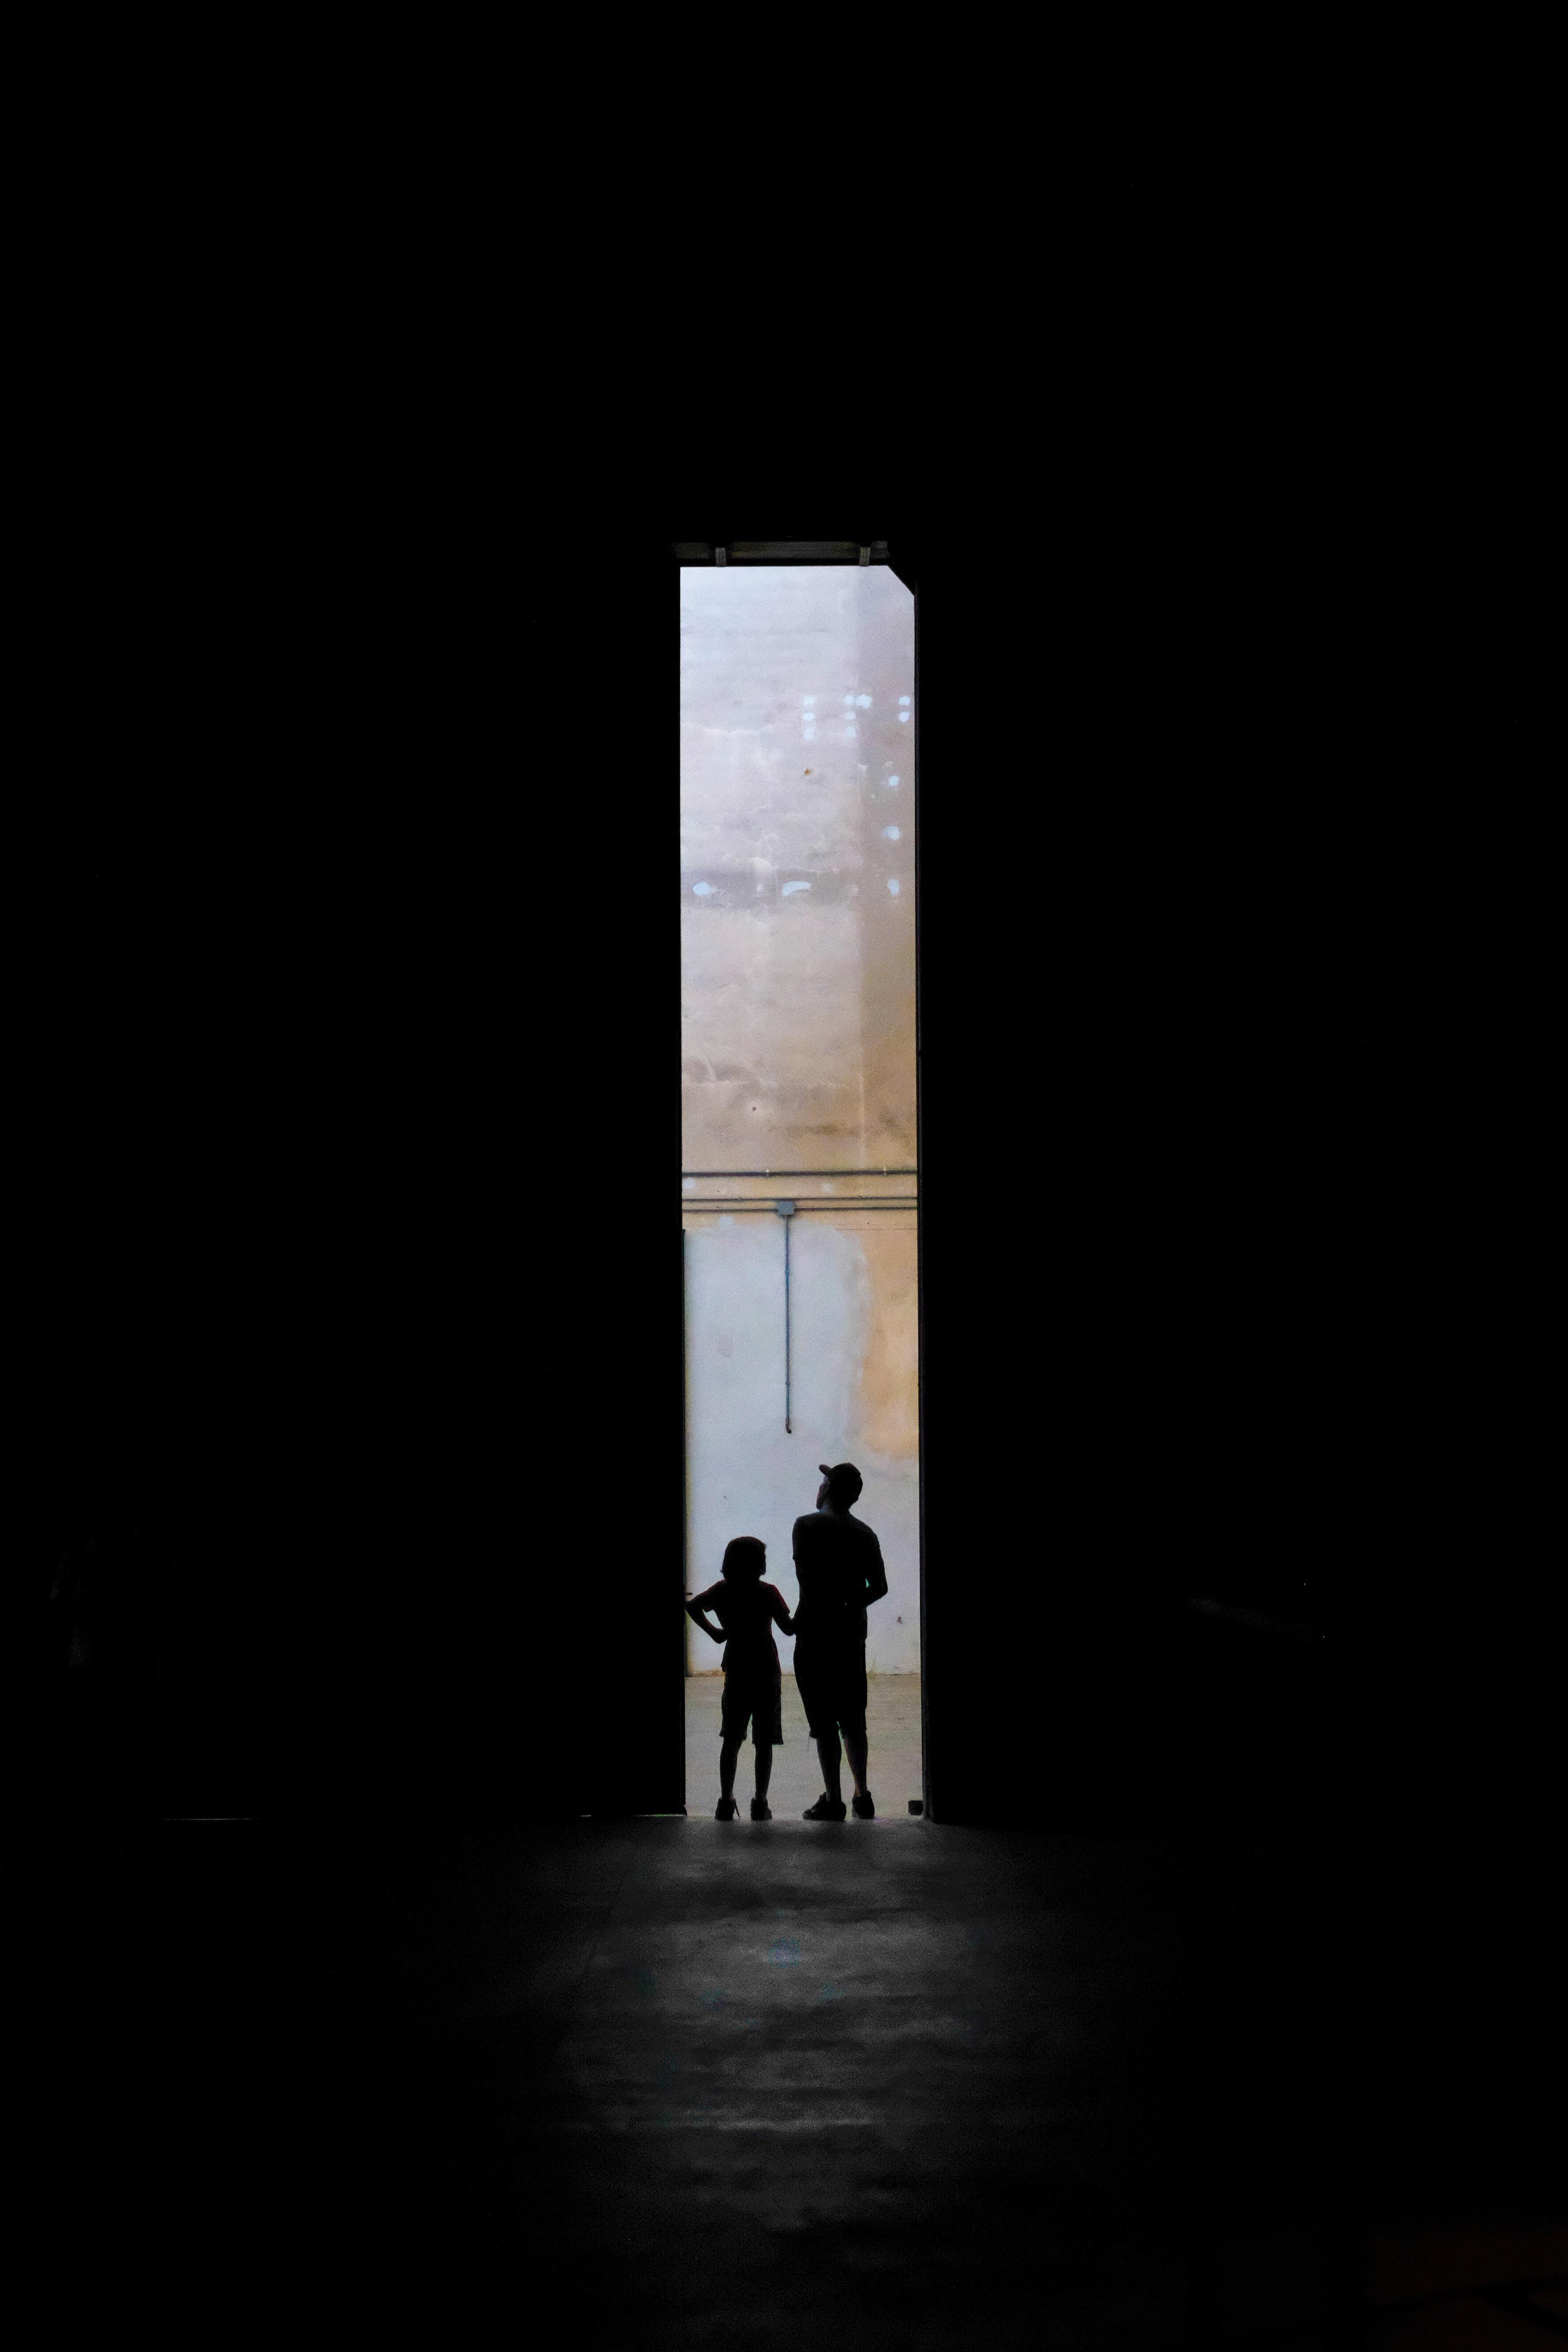 silhouette of two persons standing between doors